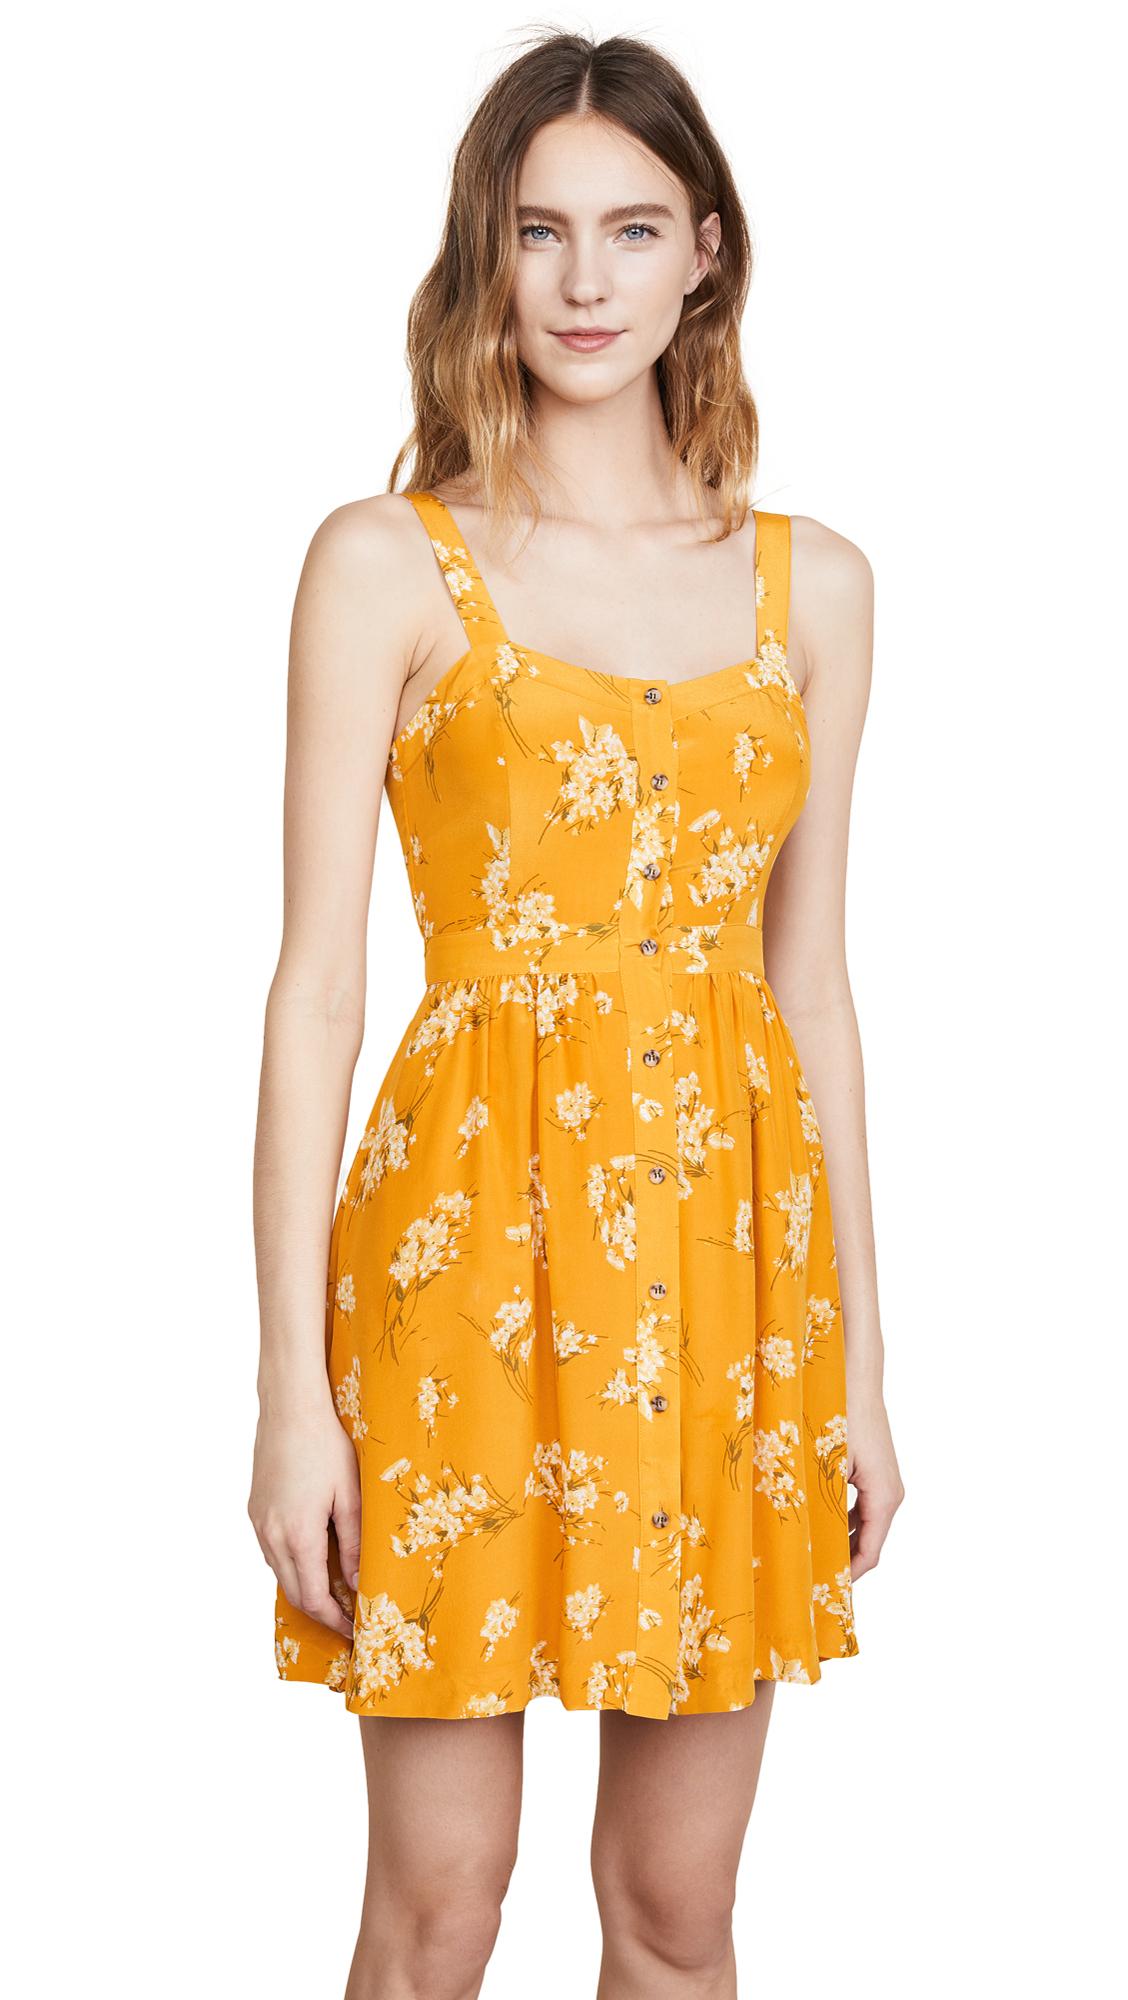 Madewell Silk Fleur Bow Back Dress